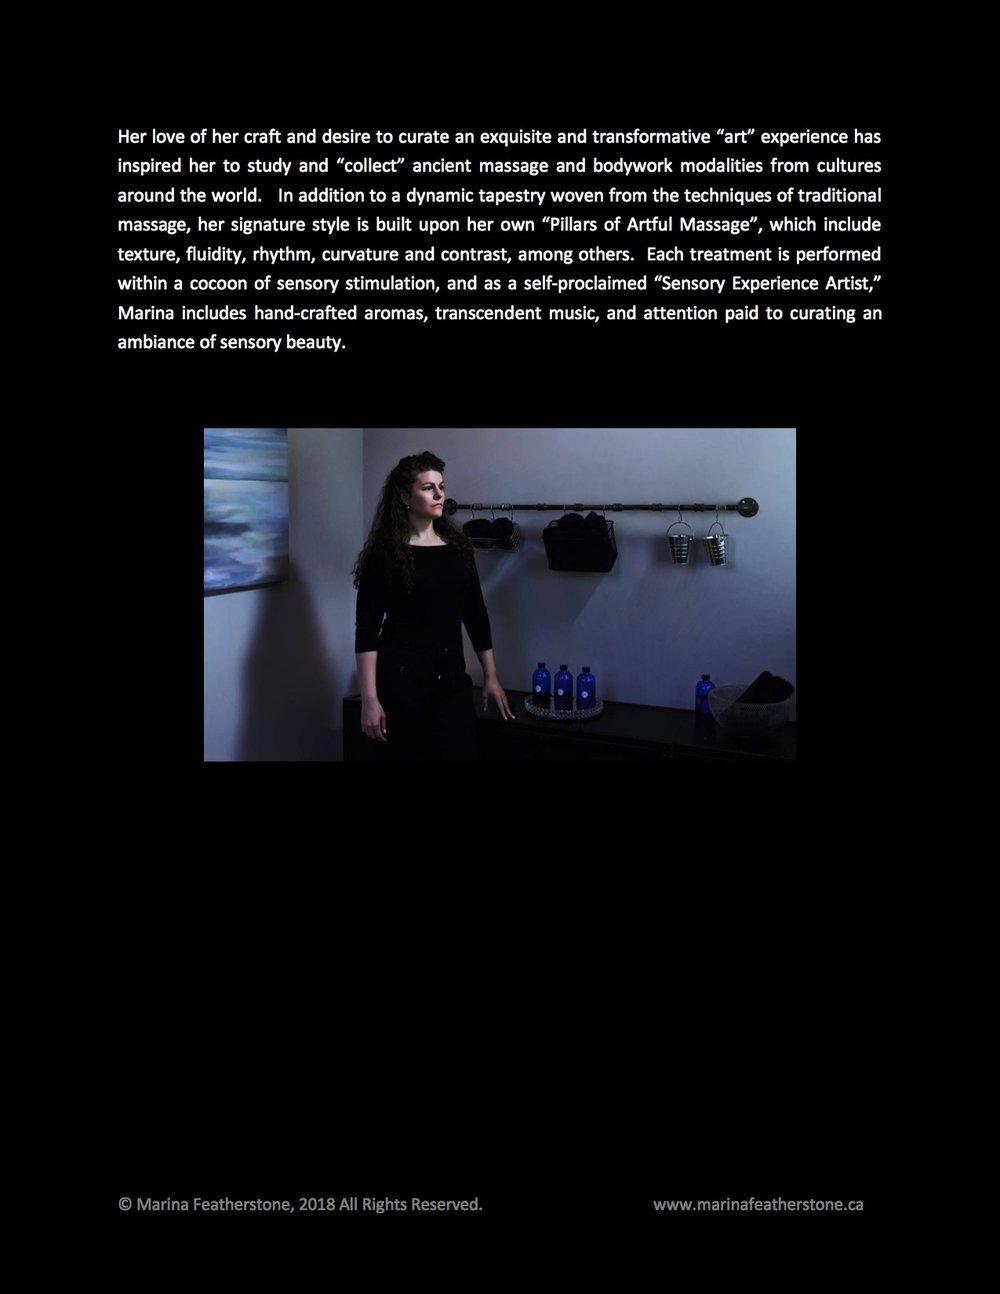 Marina Featherstone Art Massage Experience Pop-Up 5.jpg